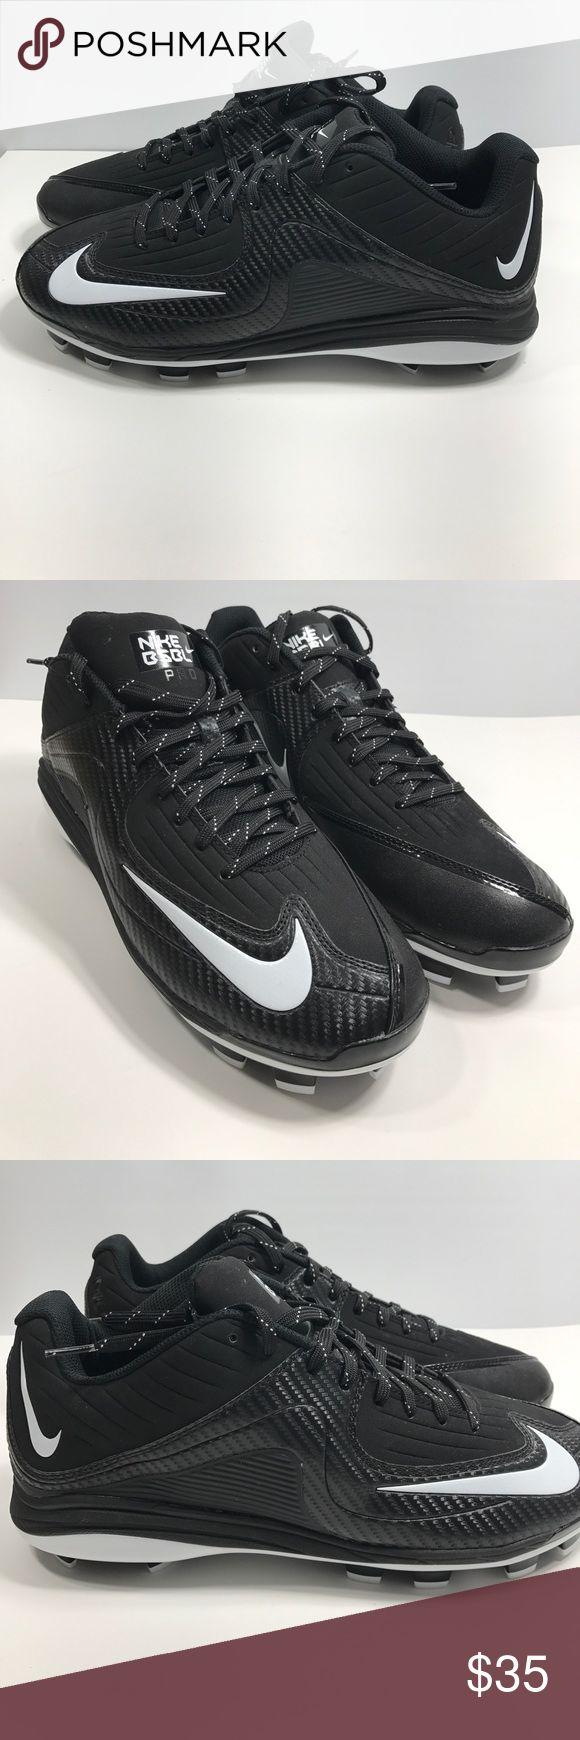 Nike Men's Air Max Pro 2 Baseball Cleats NWOB Nike baseball cleats. Black & white MVP shoes. Never worn! Size 12.5 Nike Shoes Athletic Shoes